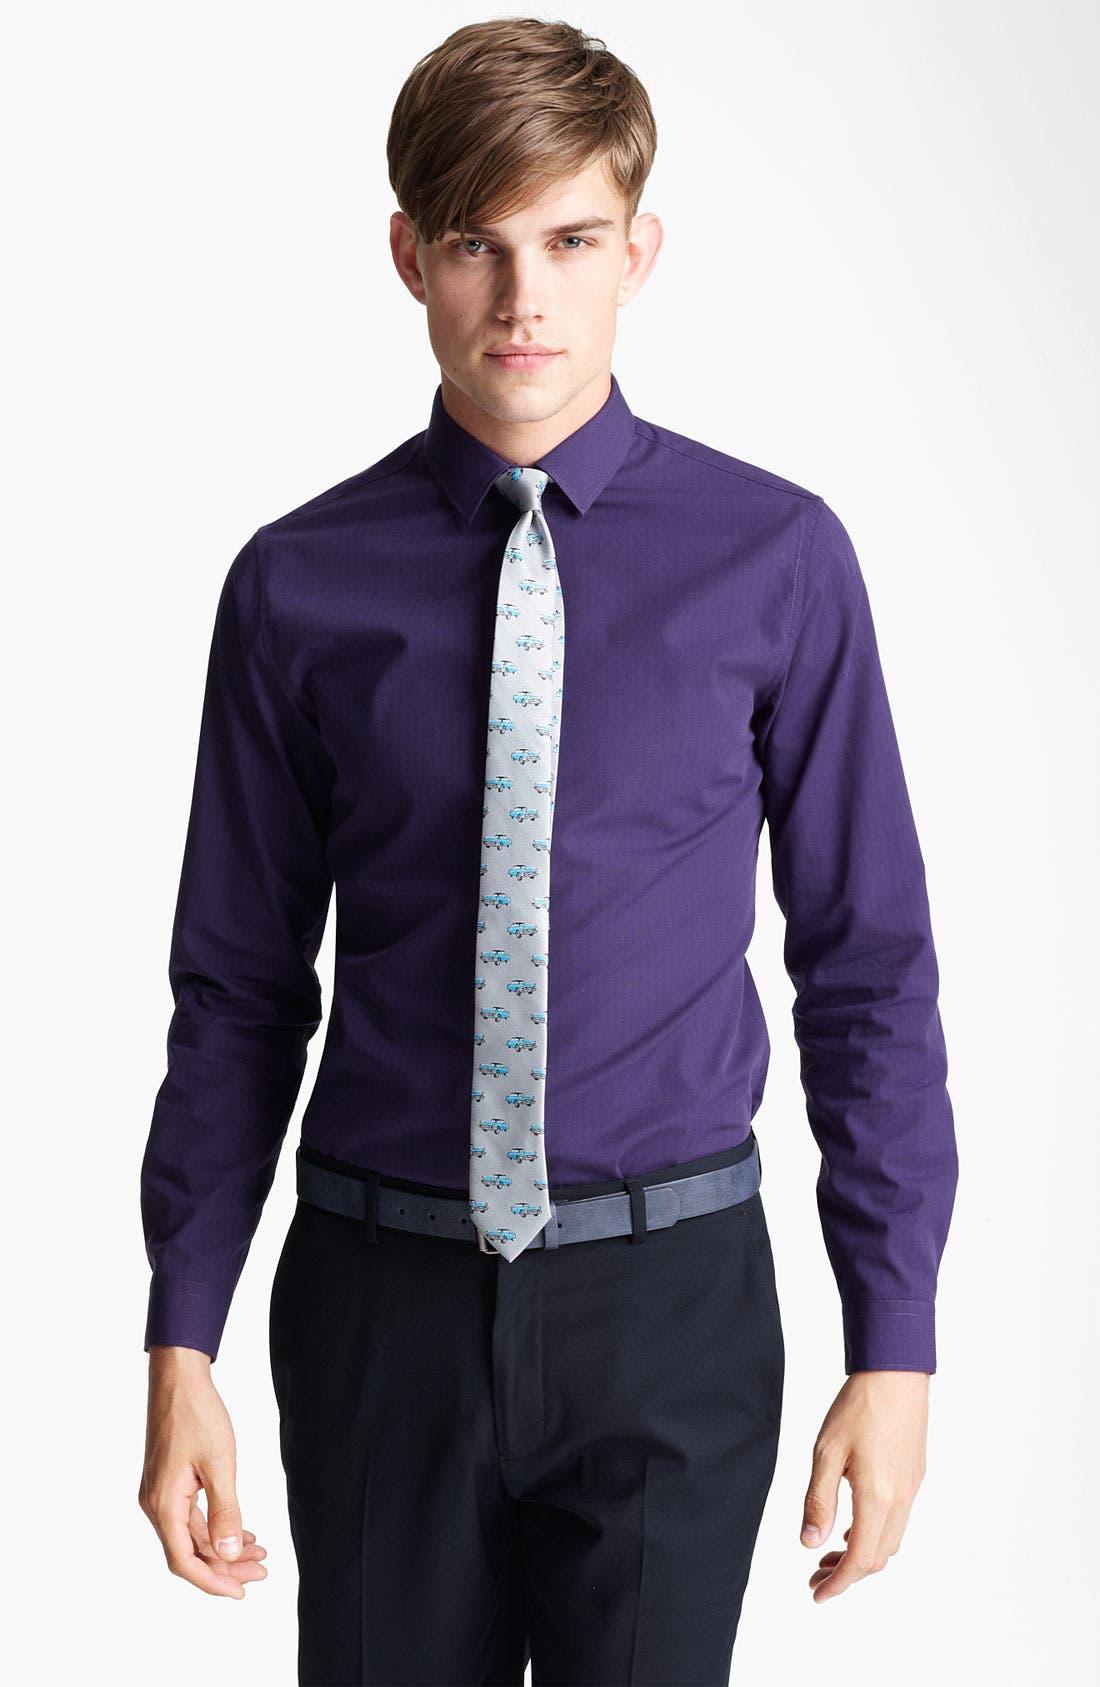 Main Image - Topman 'Smart' Extra Trim Dress Shirt